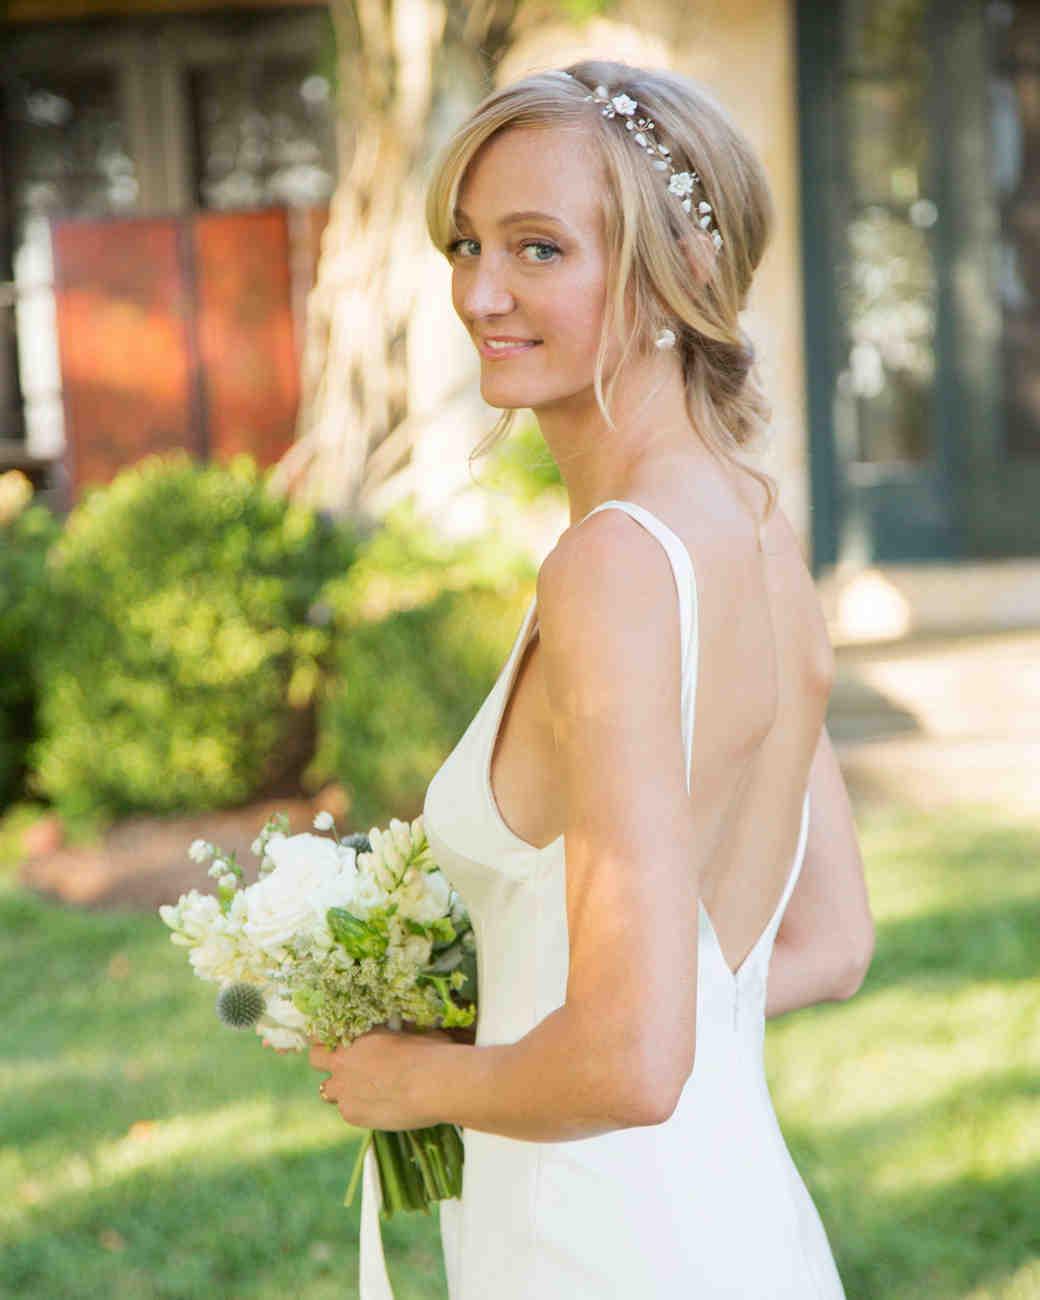 bride portrait v-neck gown wedding